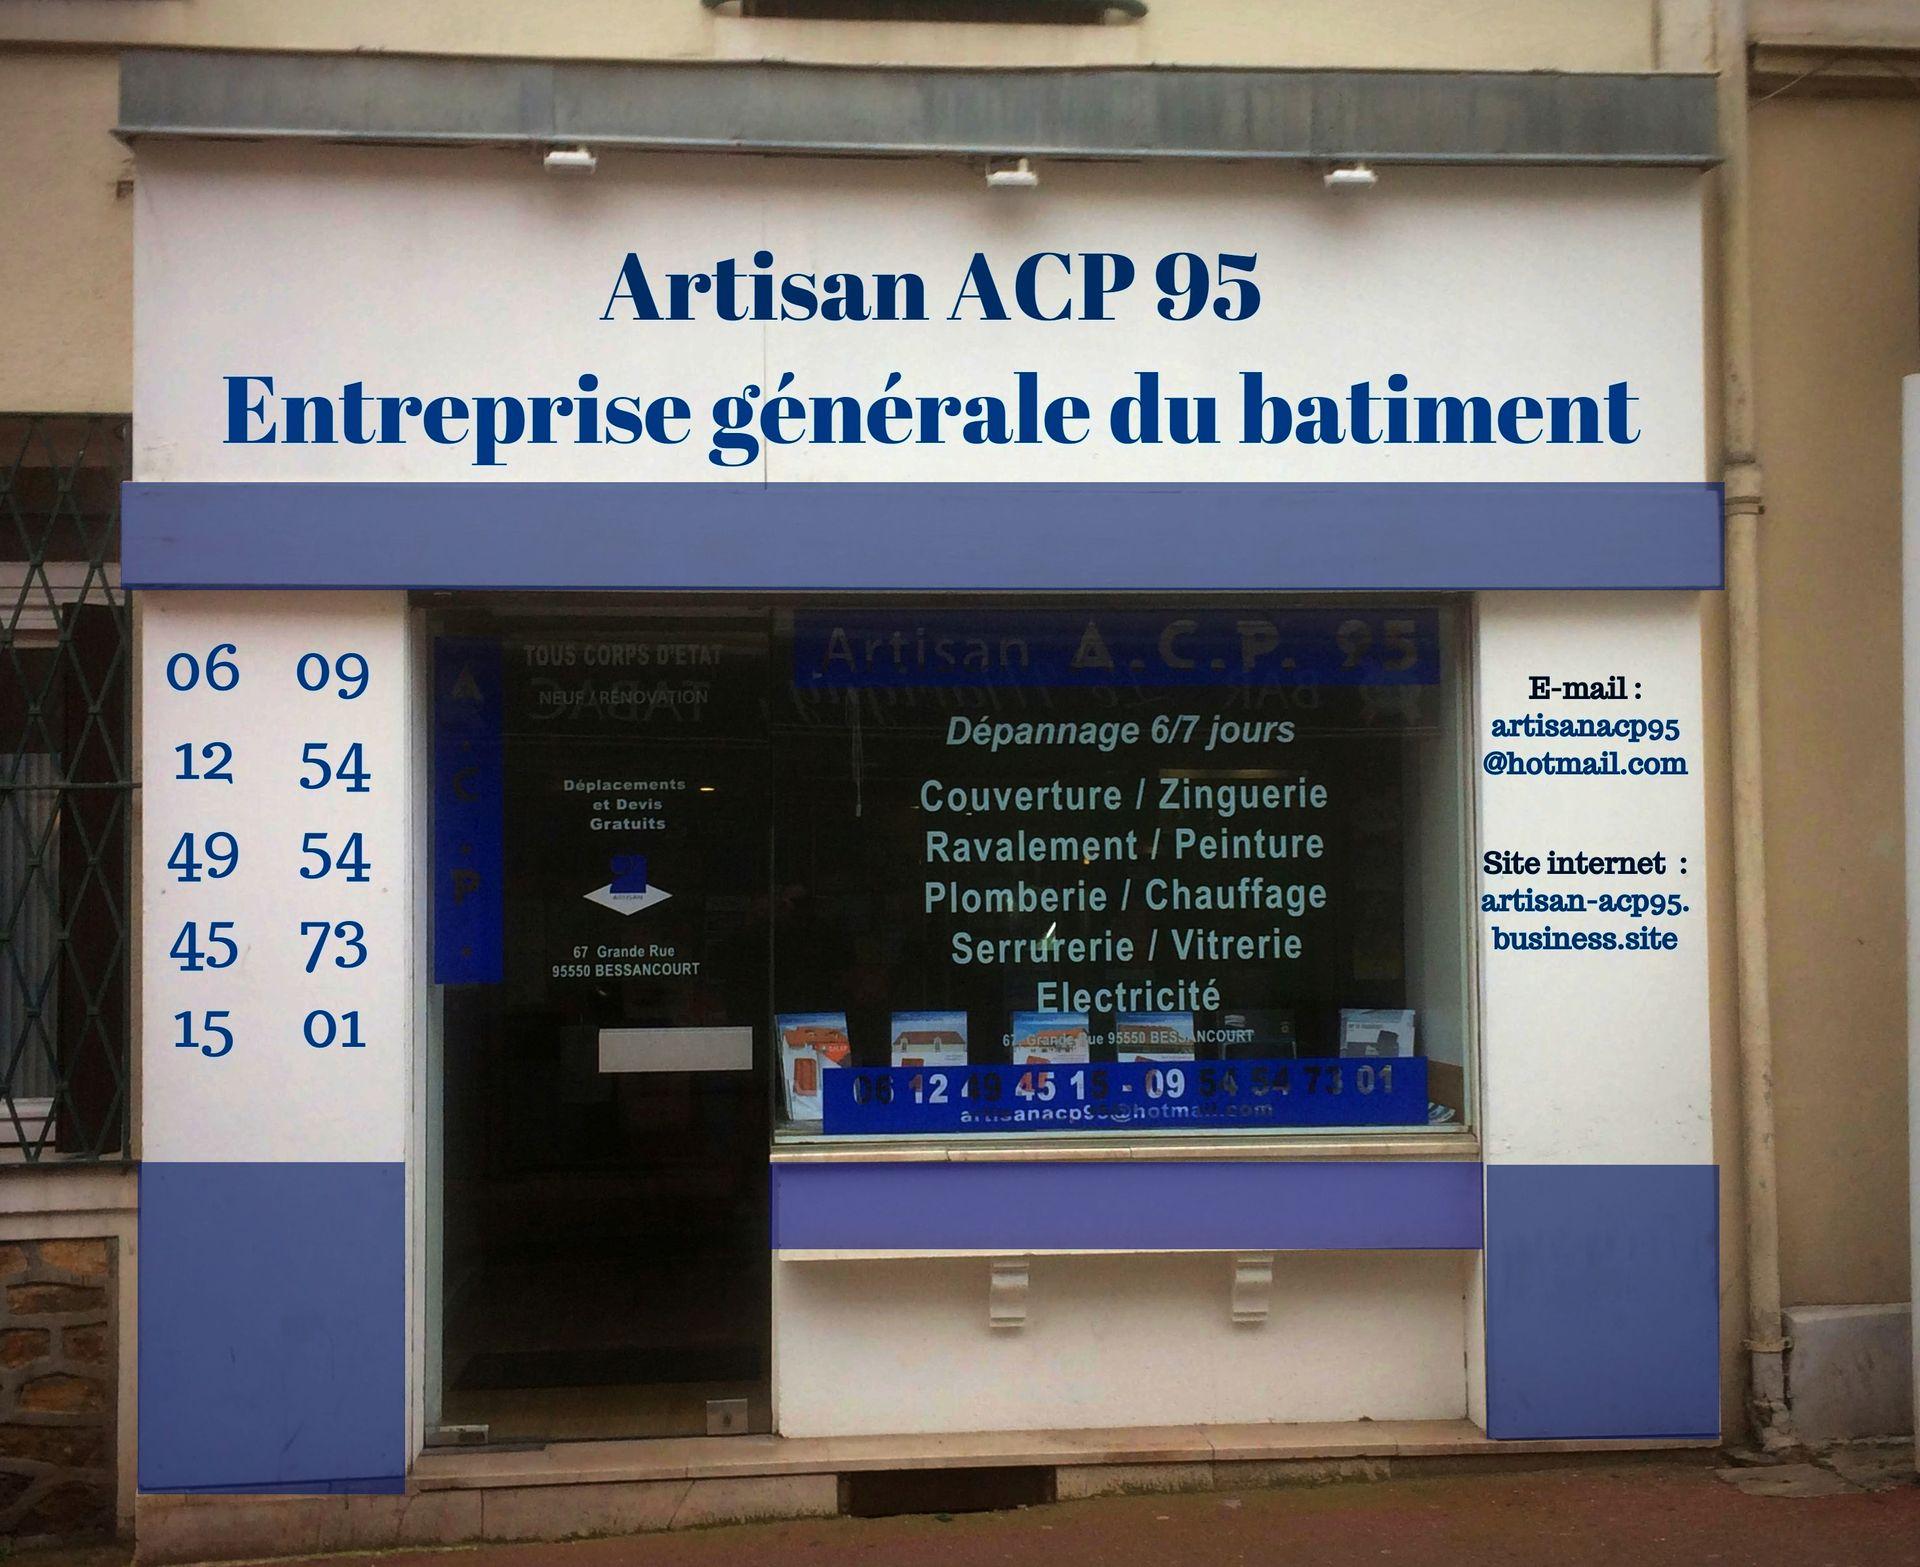 ACP 95 peintre (artiste)